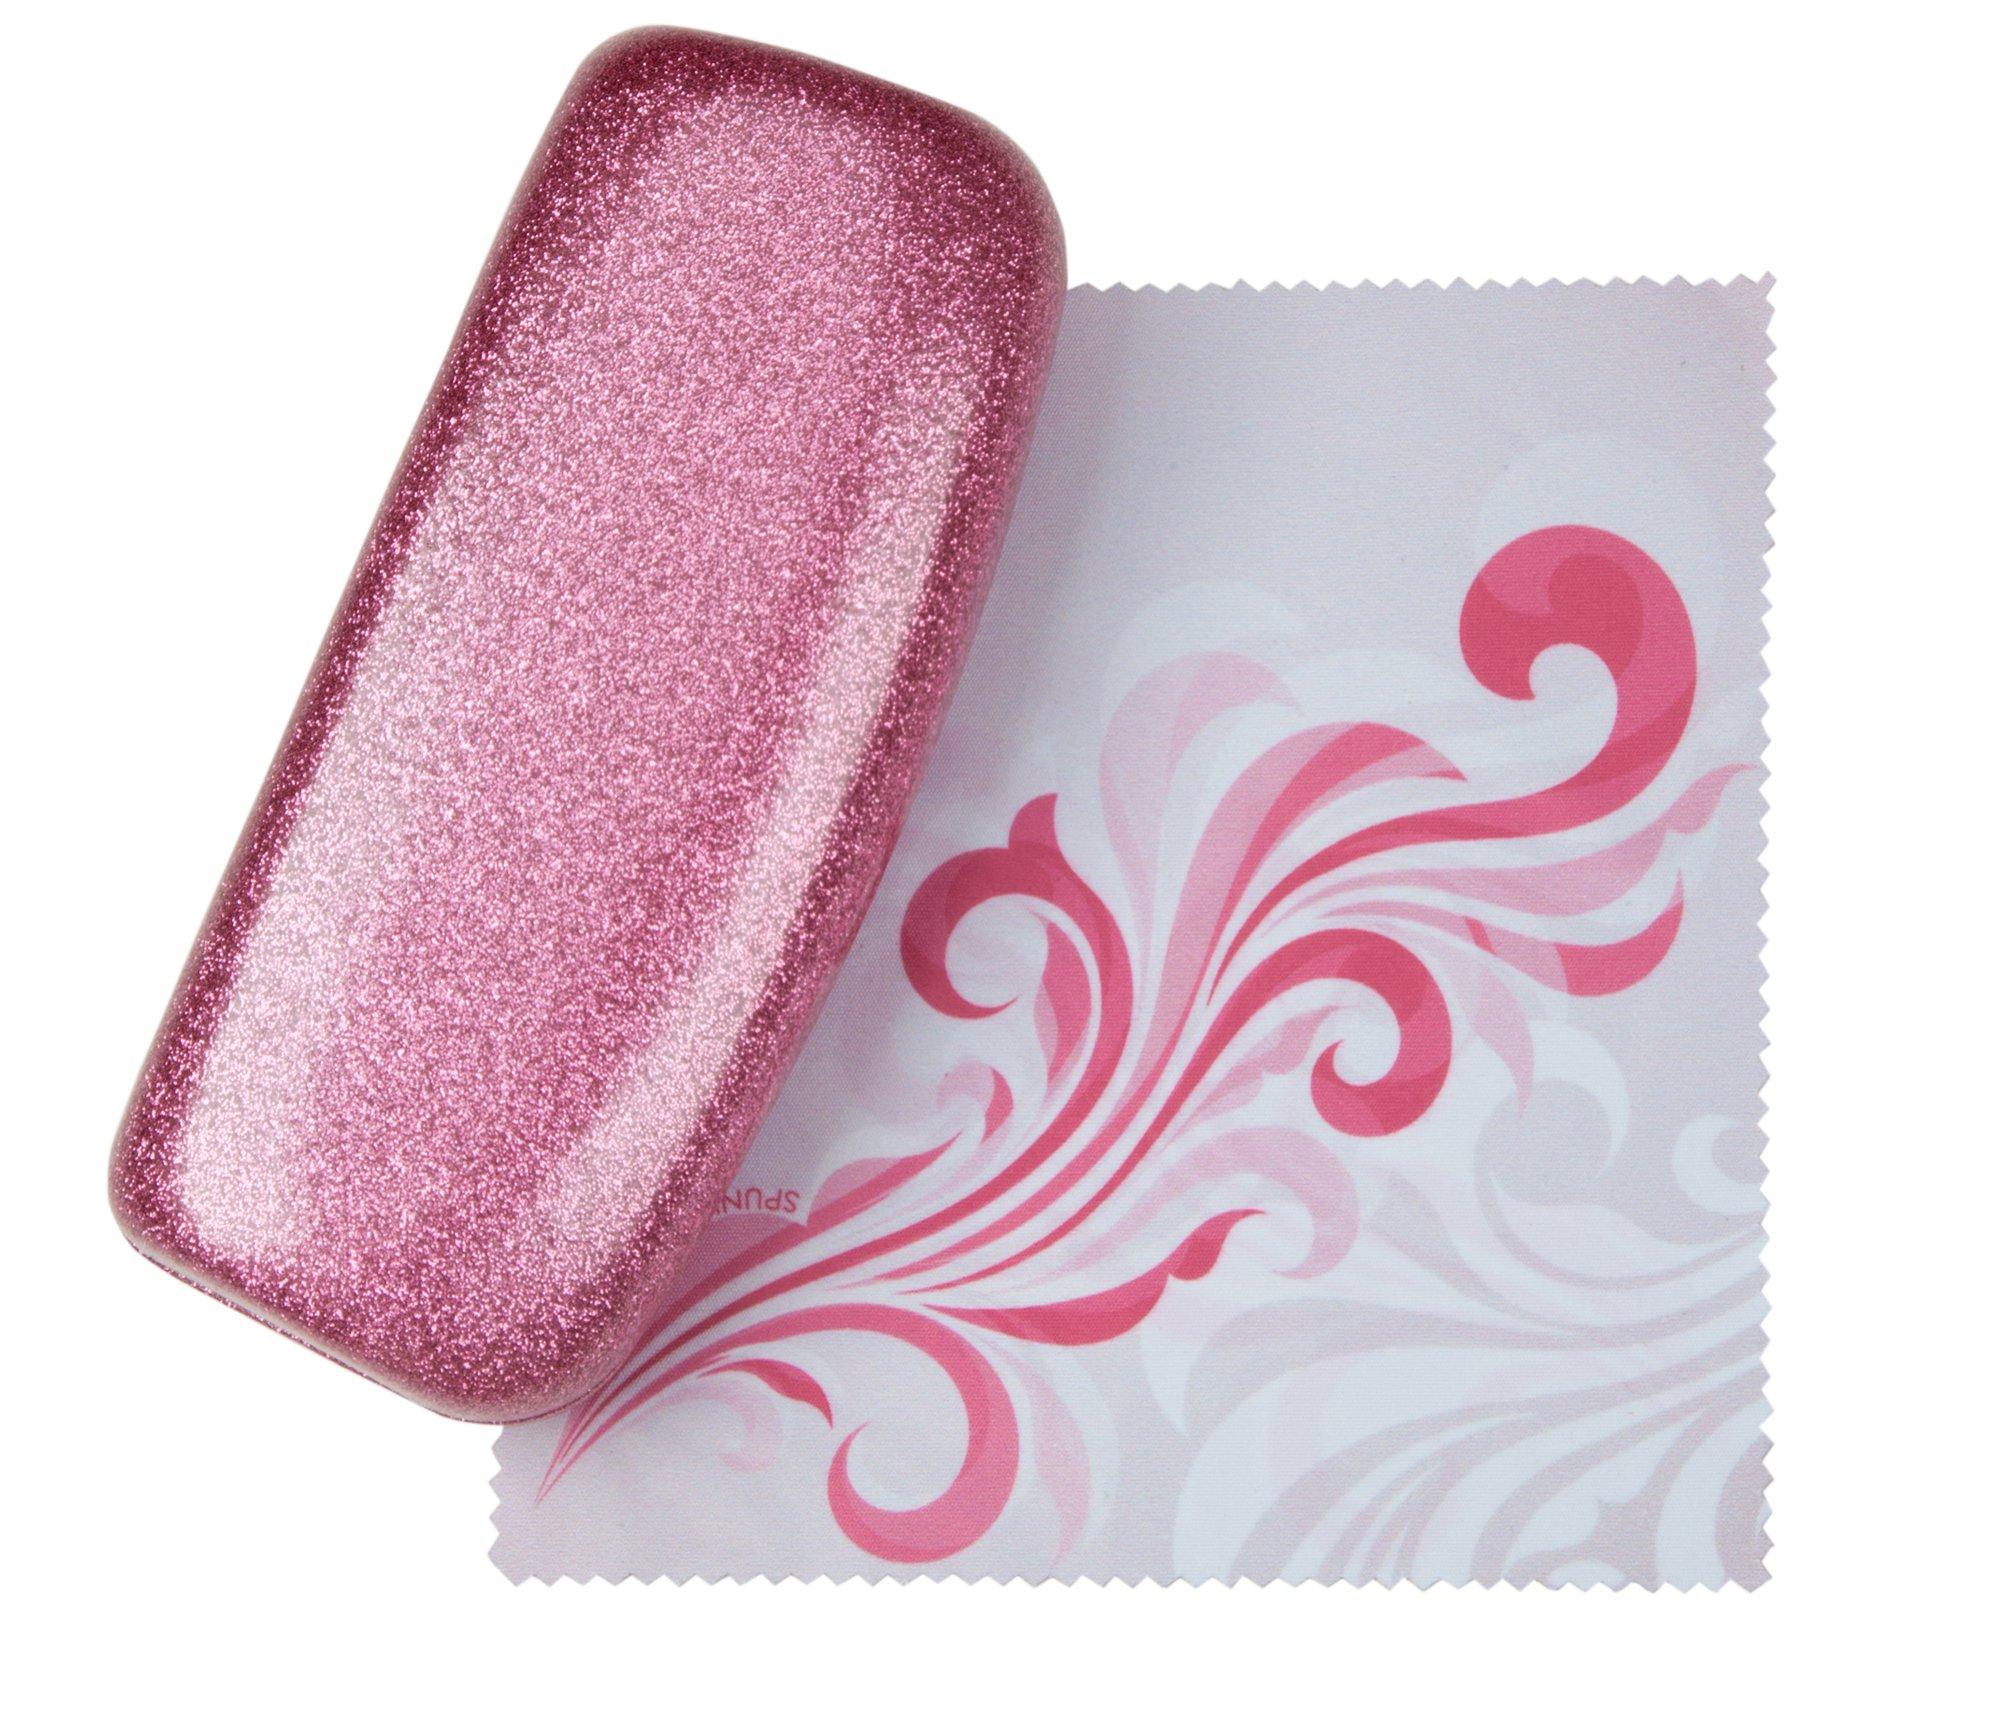 Poetic Pink Medium Premium Fashion Women's Hard Eyeglasses Case By Spunky Soul | Glitter Light Pink | Bonus Cleaning Cloth